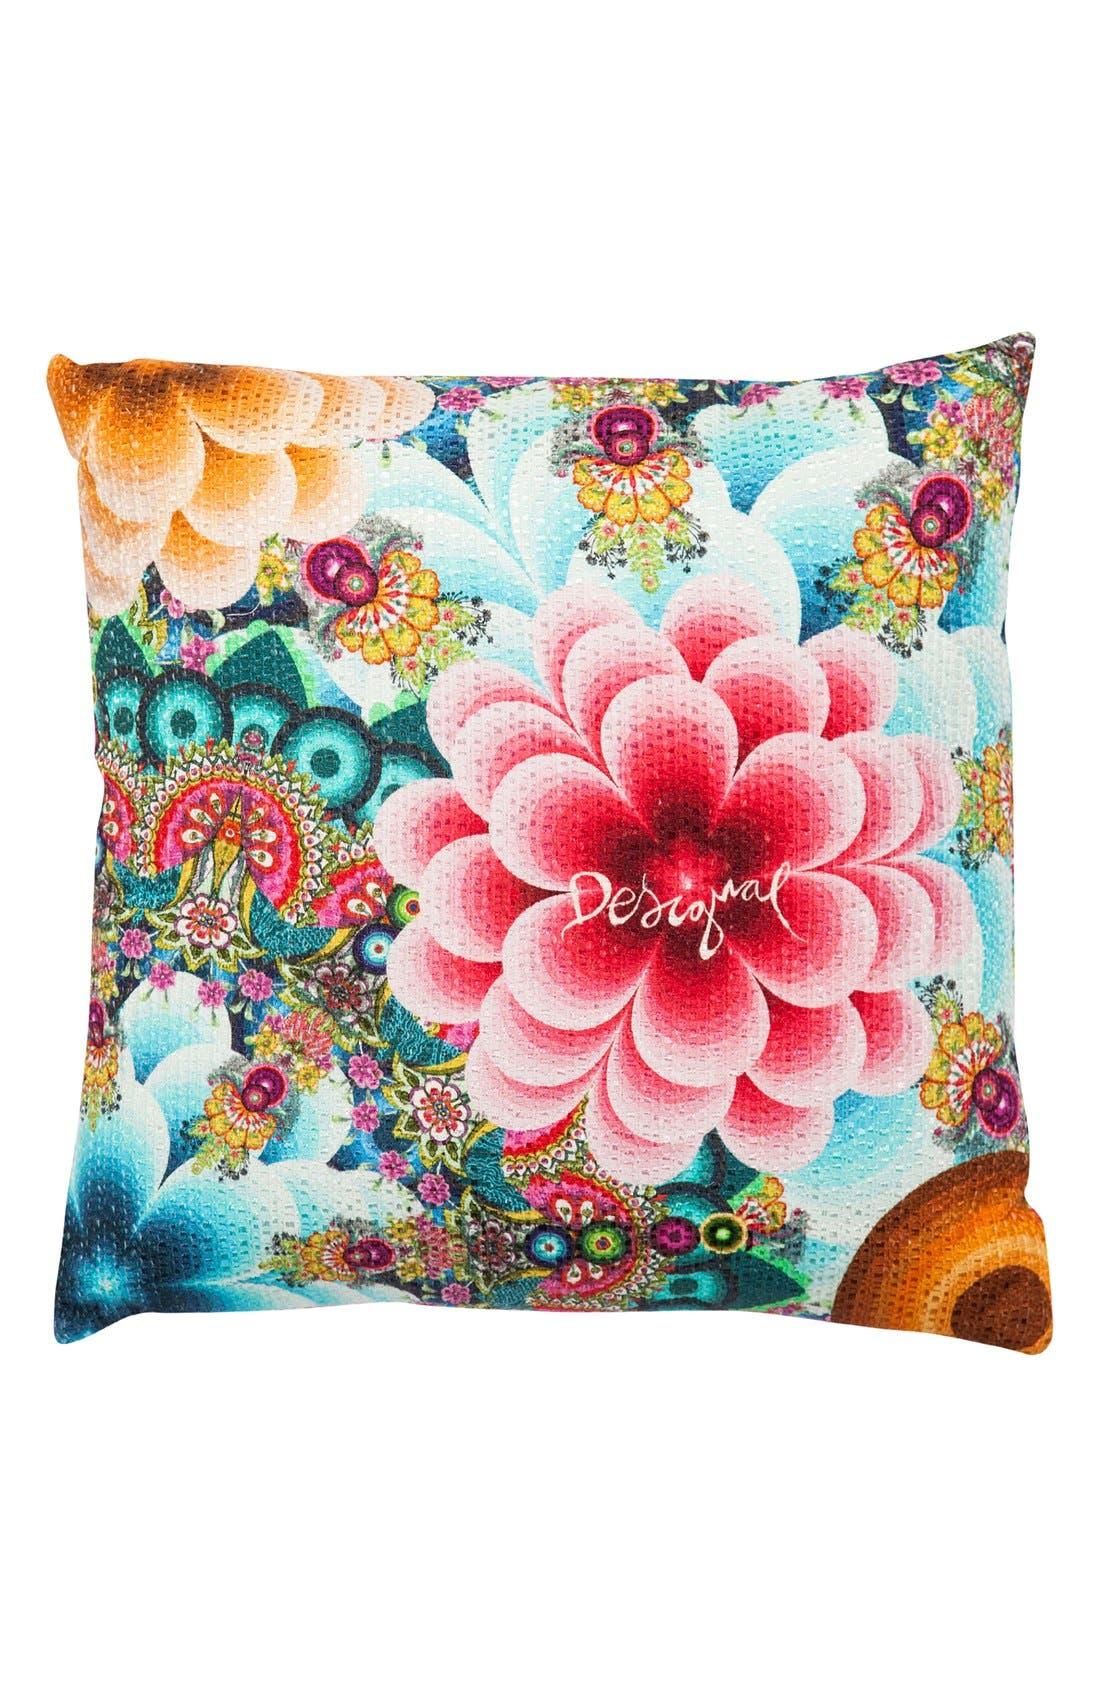 Alternate Image 1 Selected - Desigual 'Mandala' Accent Pillow